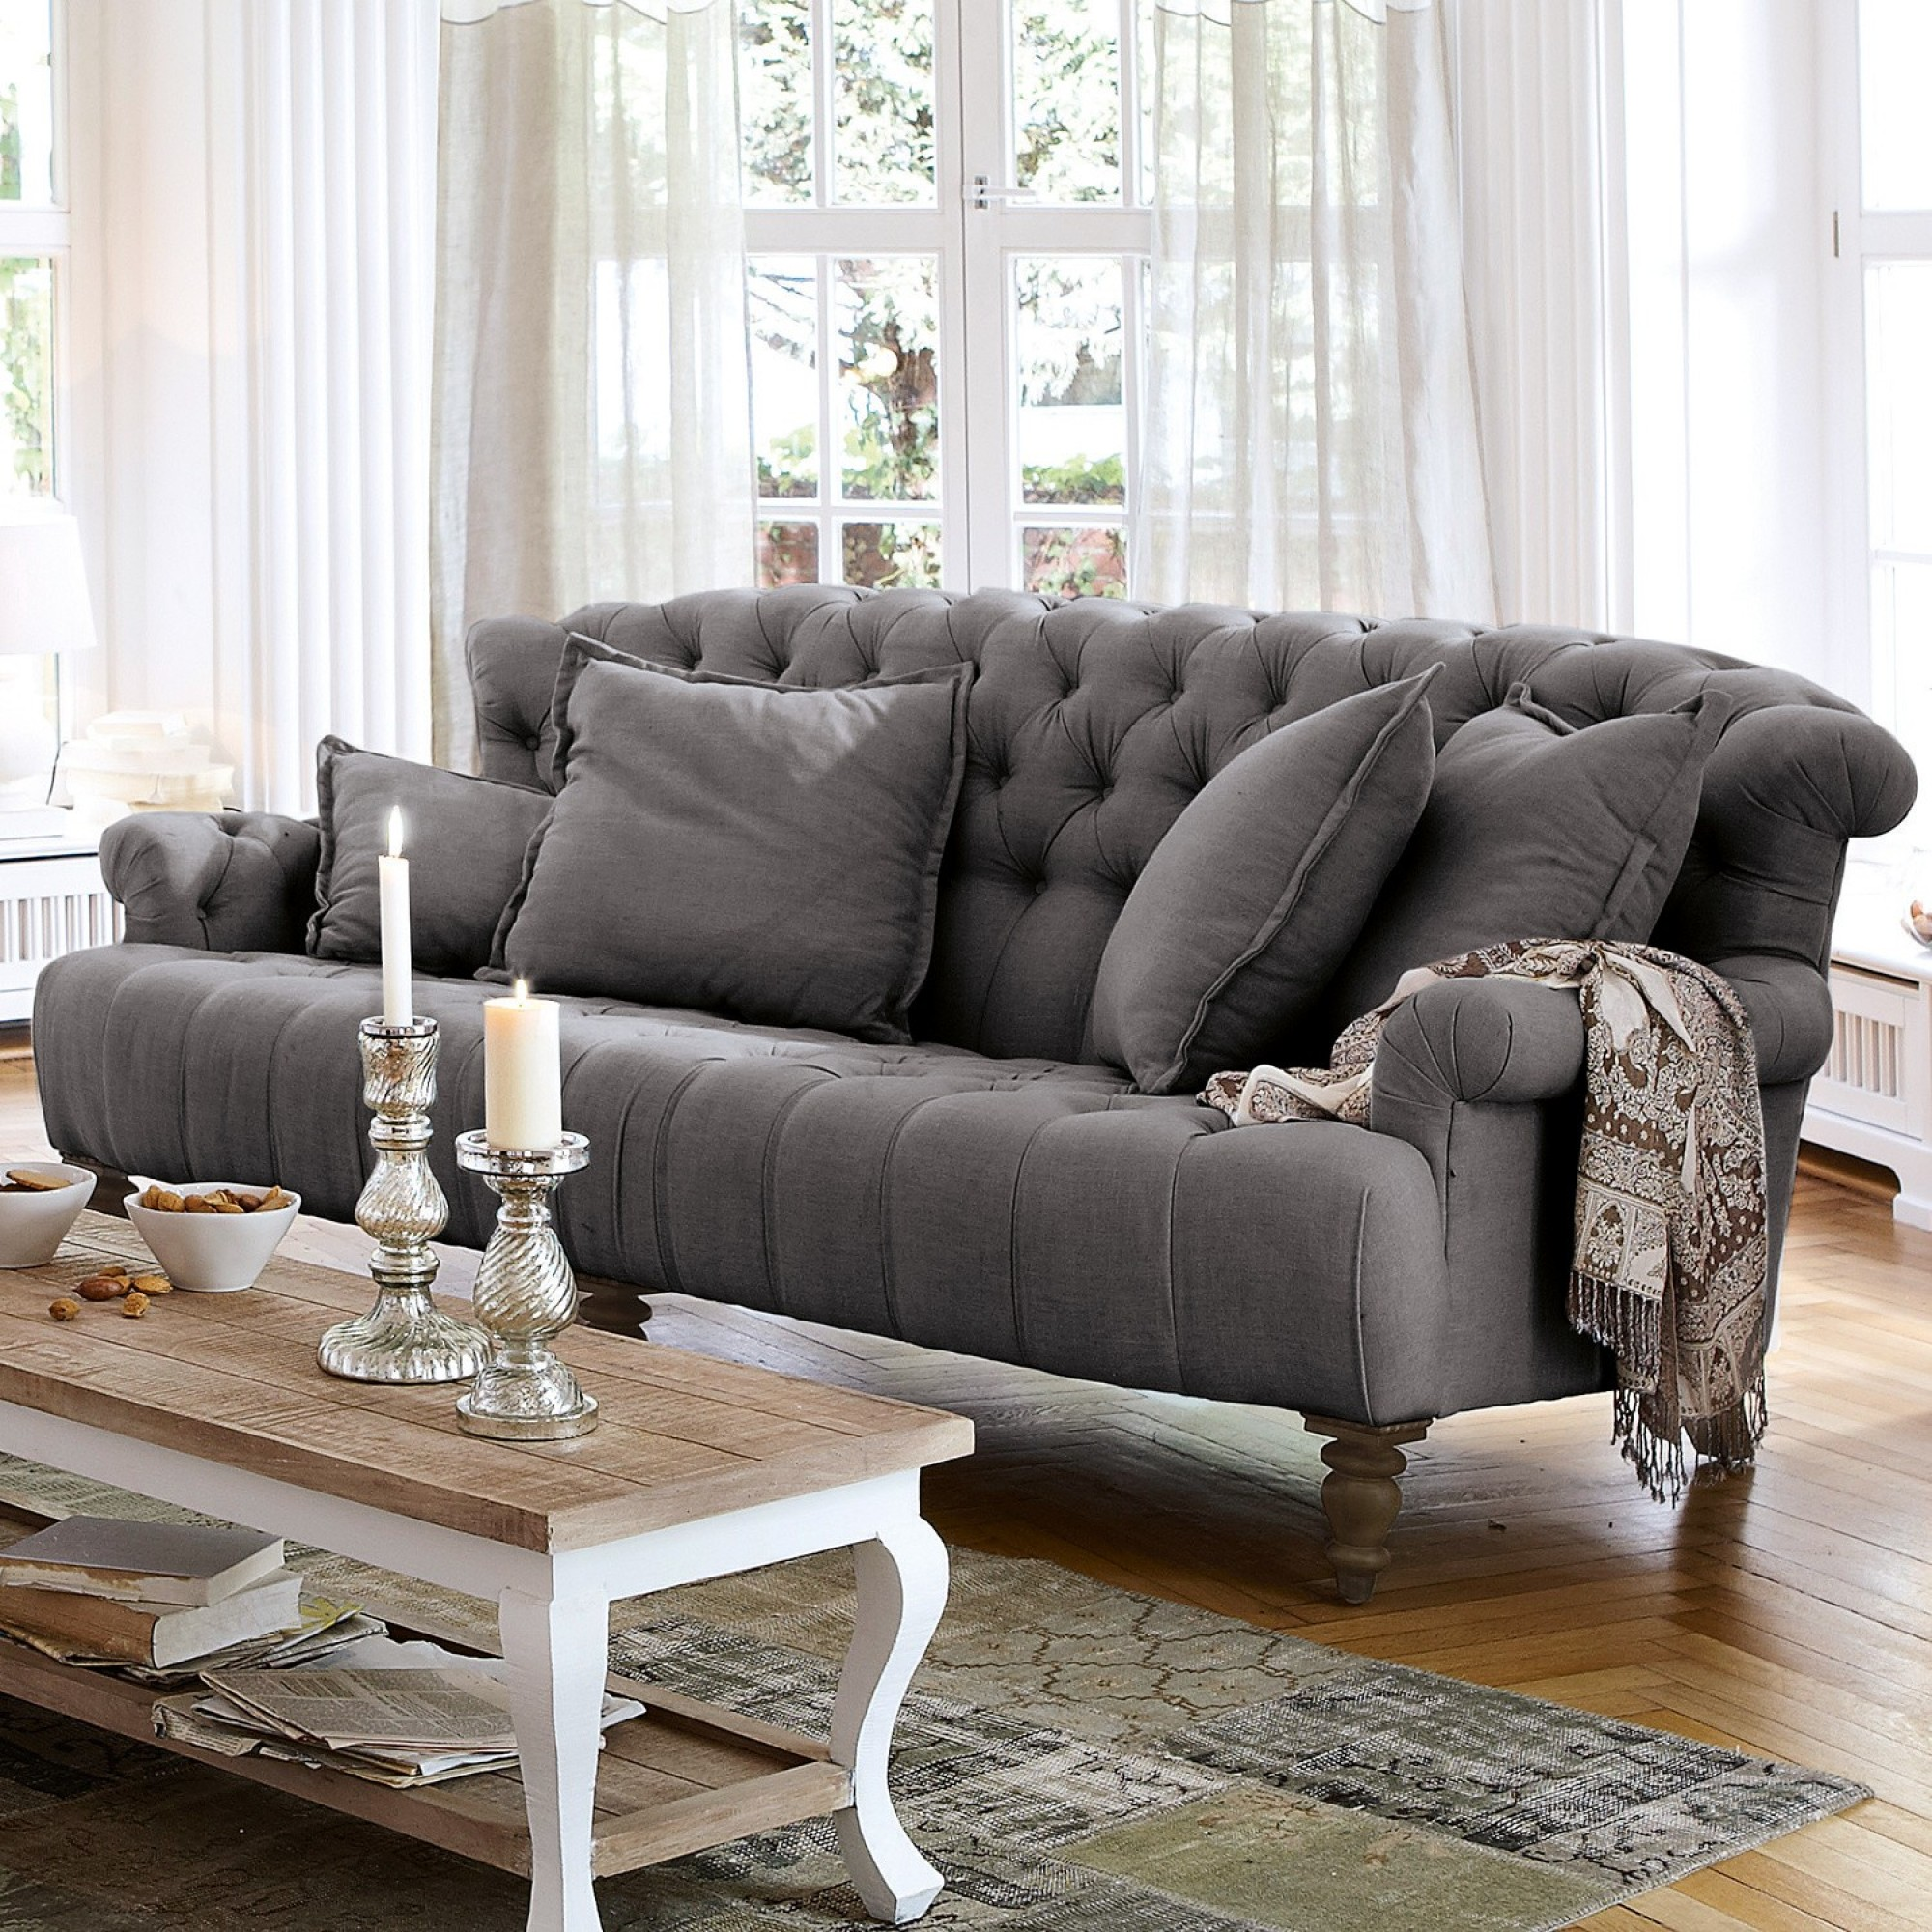 sofa springfield village anthrazit loberon. Black Bedroom Furniture Sets. Home Design Ideas